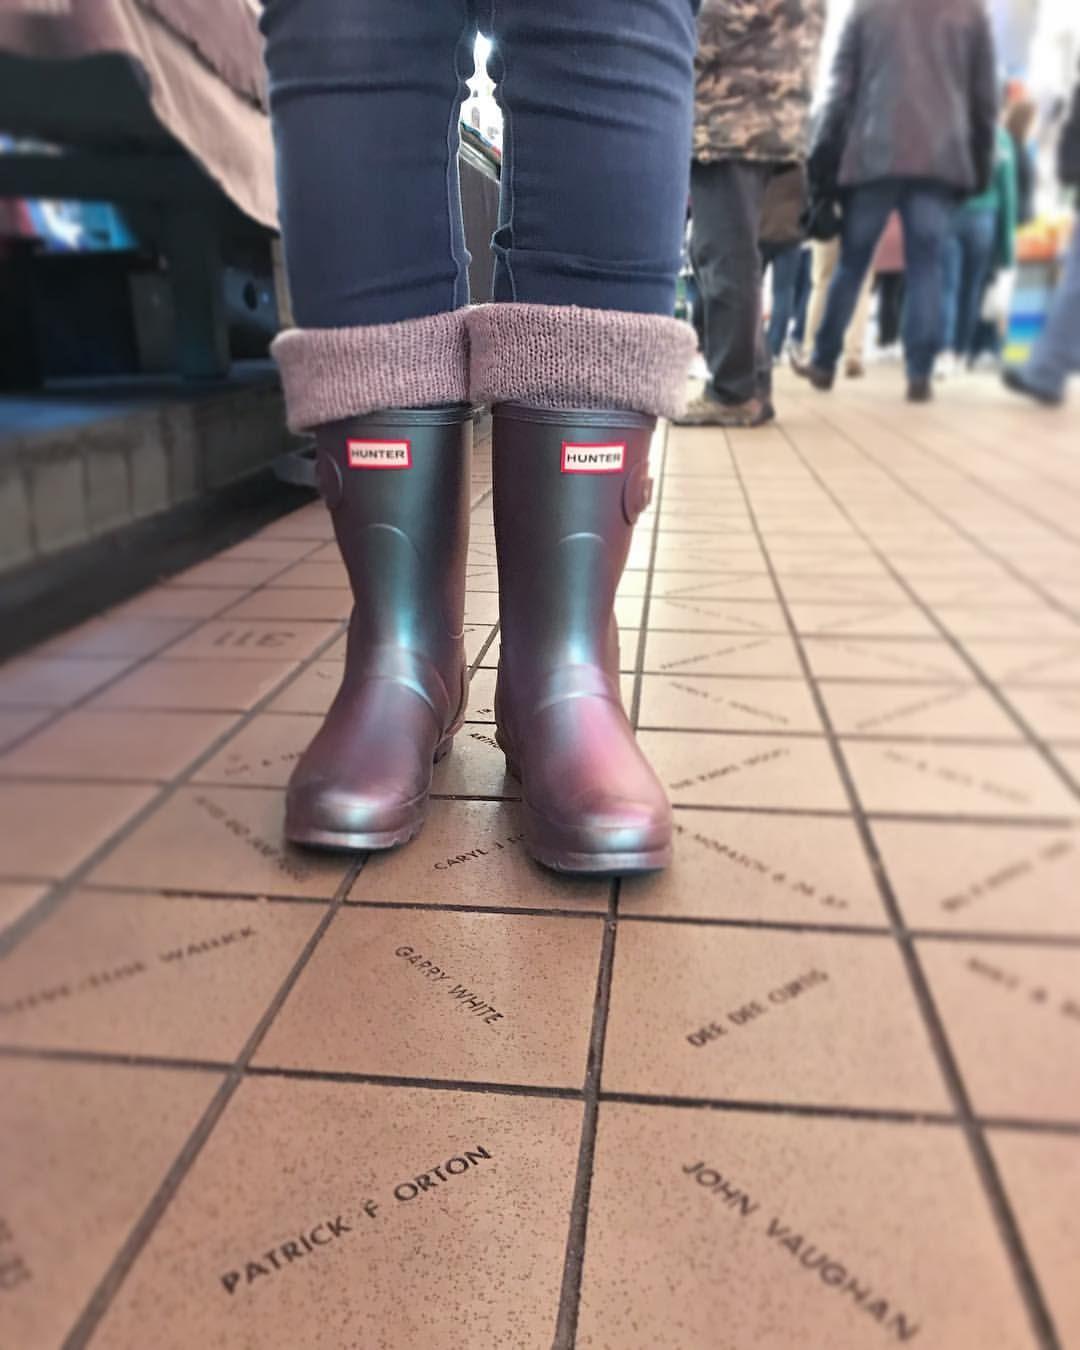 SmMed 6-8 Boot Boot Cuff Insert SLUGS Fleece Rain Boot Liners Solid Pink Fall Winter Rainy Day Fashion Wellington Boot Socks